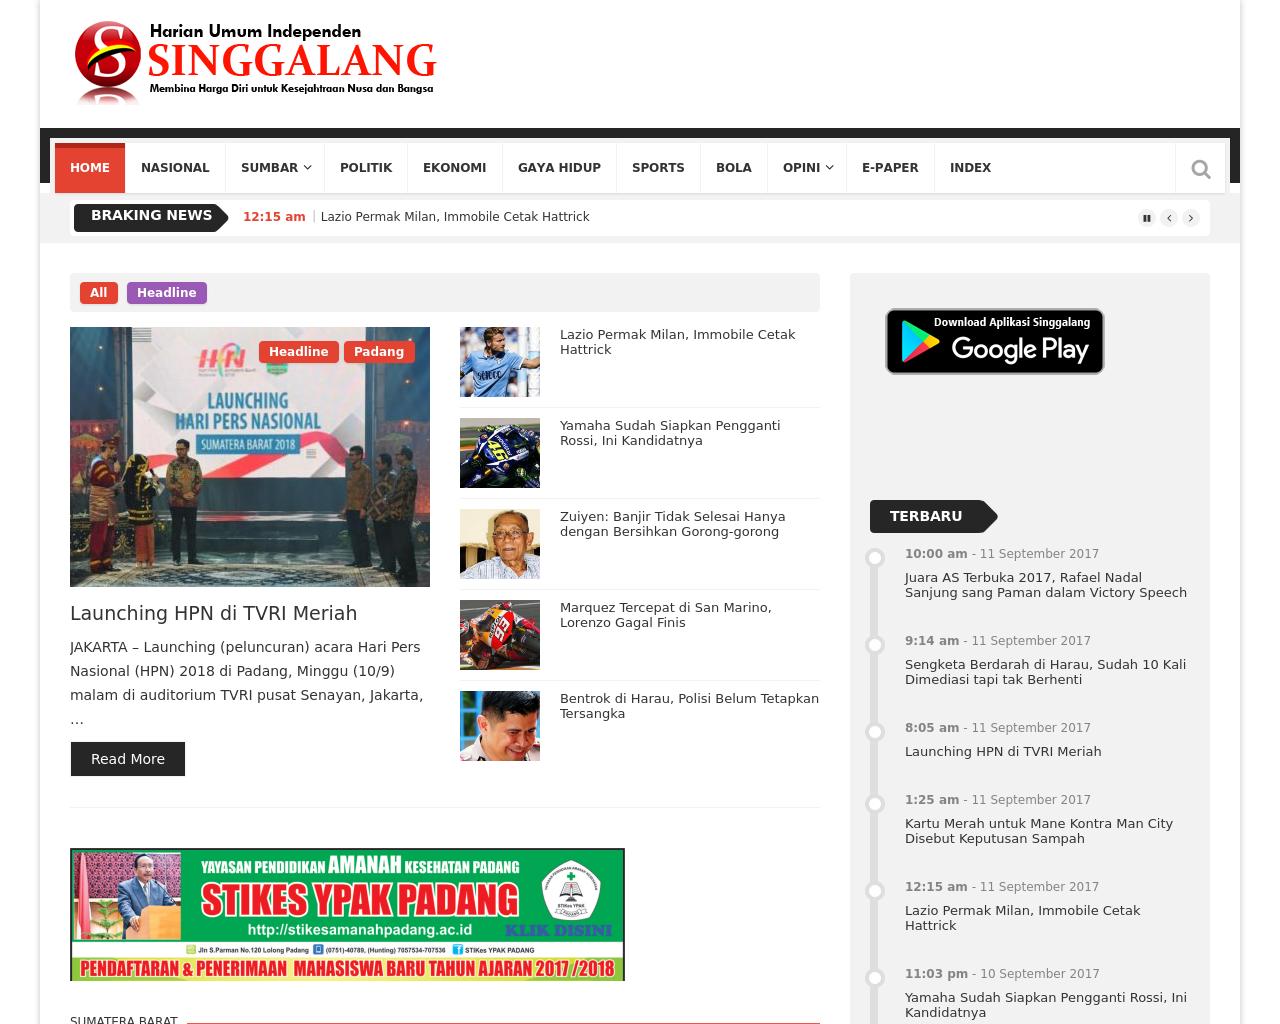 Harian-Umum-Independen-Singgalang-Advertising-Reviews-Pricing